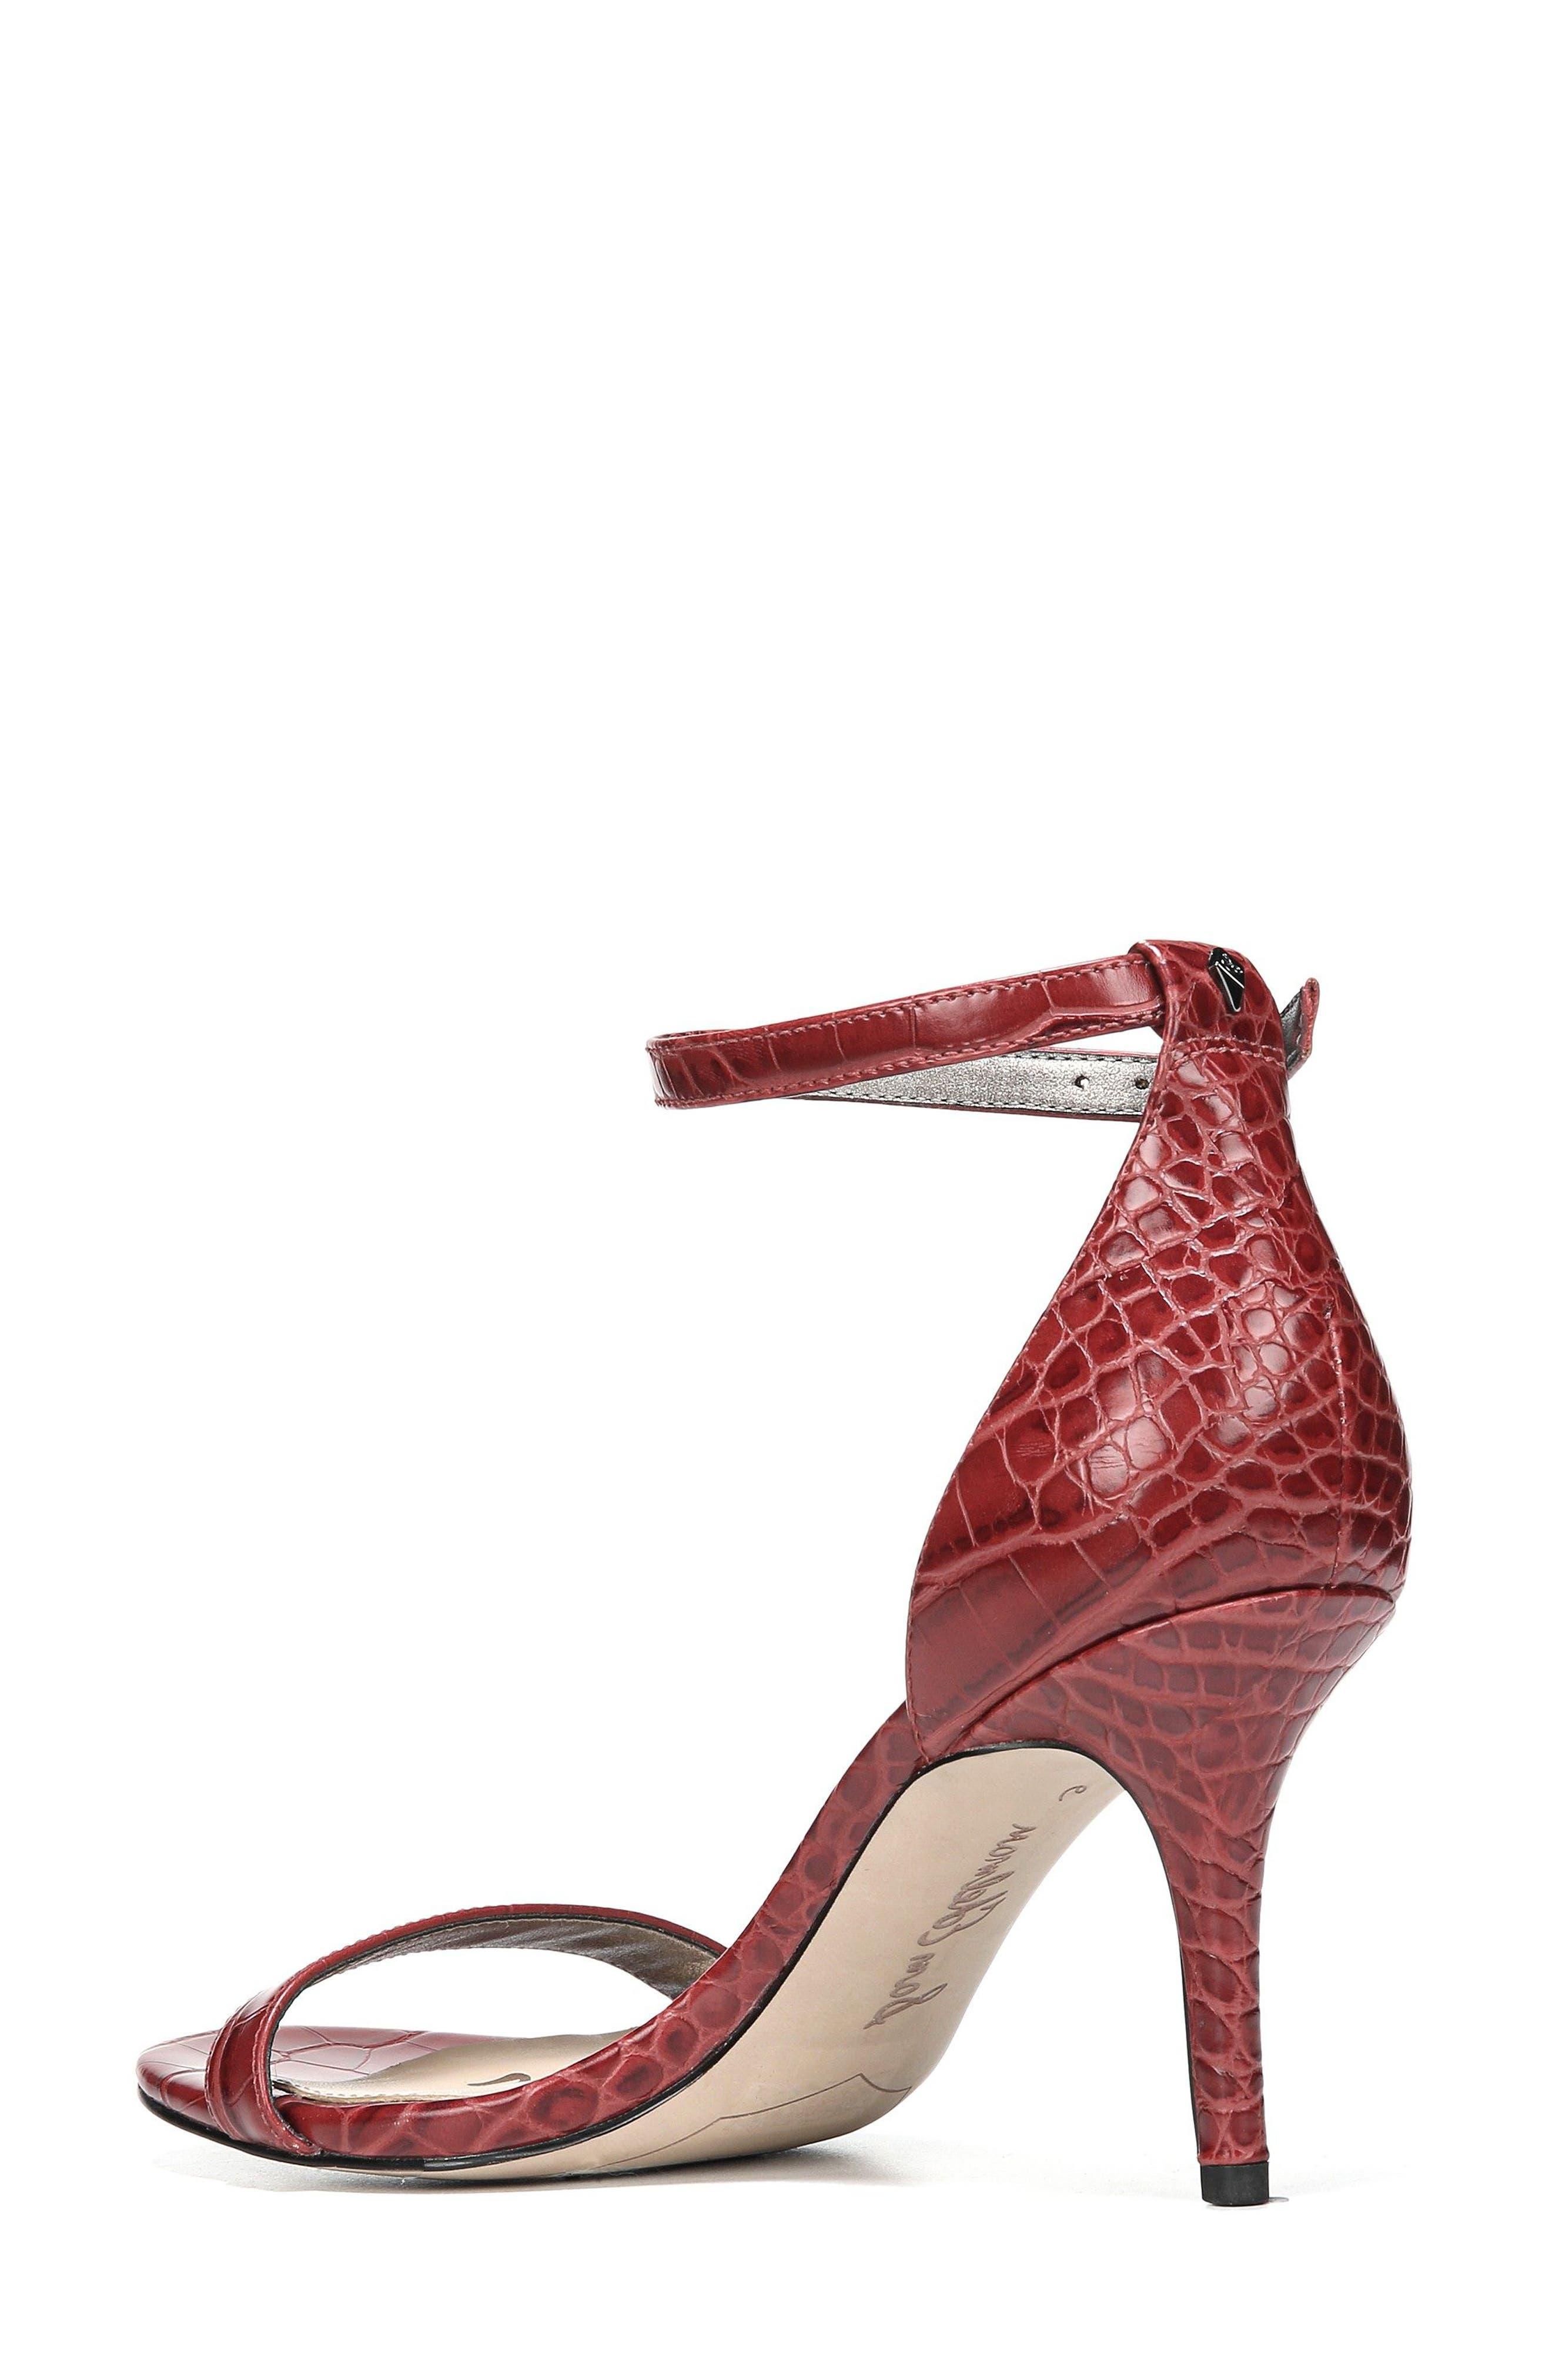 ,                             'Patti' Ankle Strap Sandal,                             Alternate thumbnail 109, color,                             602